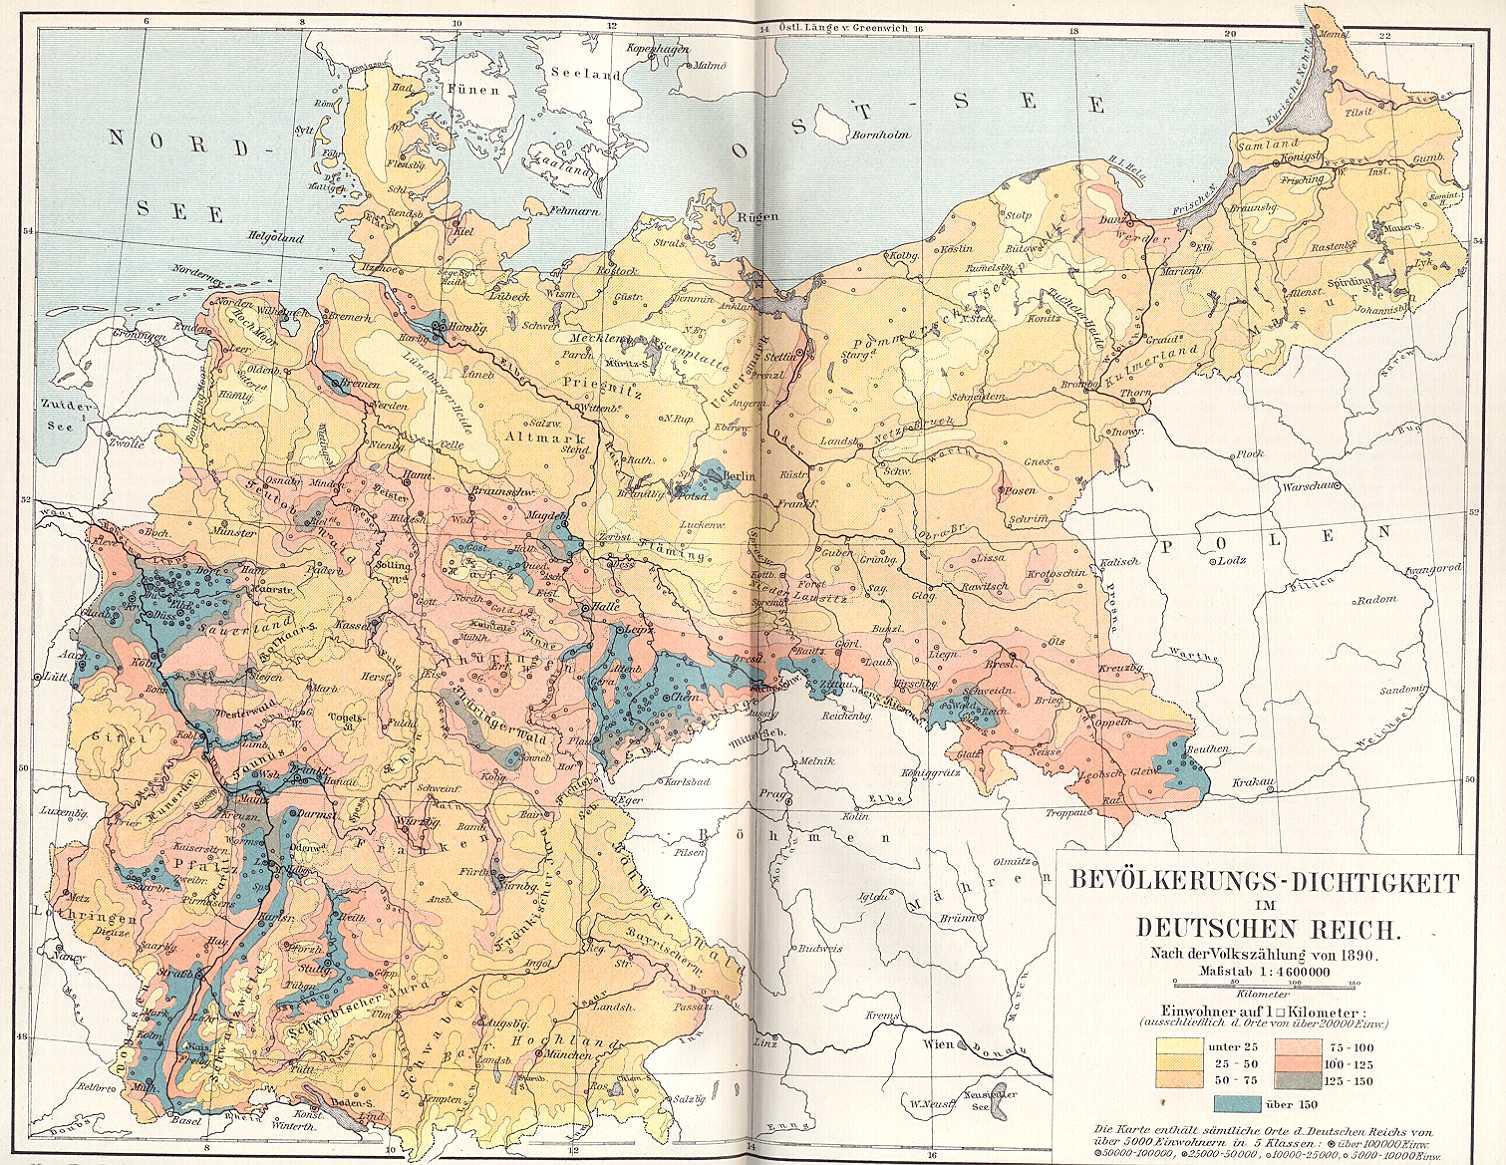 Alte Karte Deutschland 1940.Alte Karte Deutschland 1940 Karte